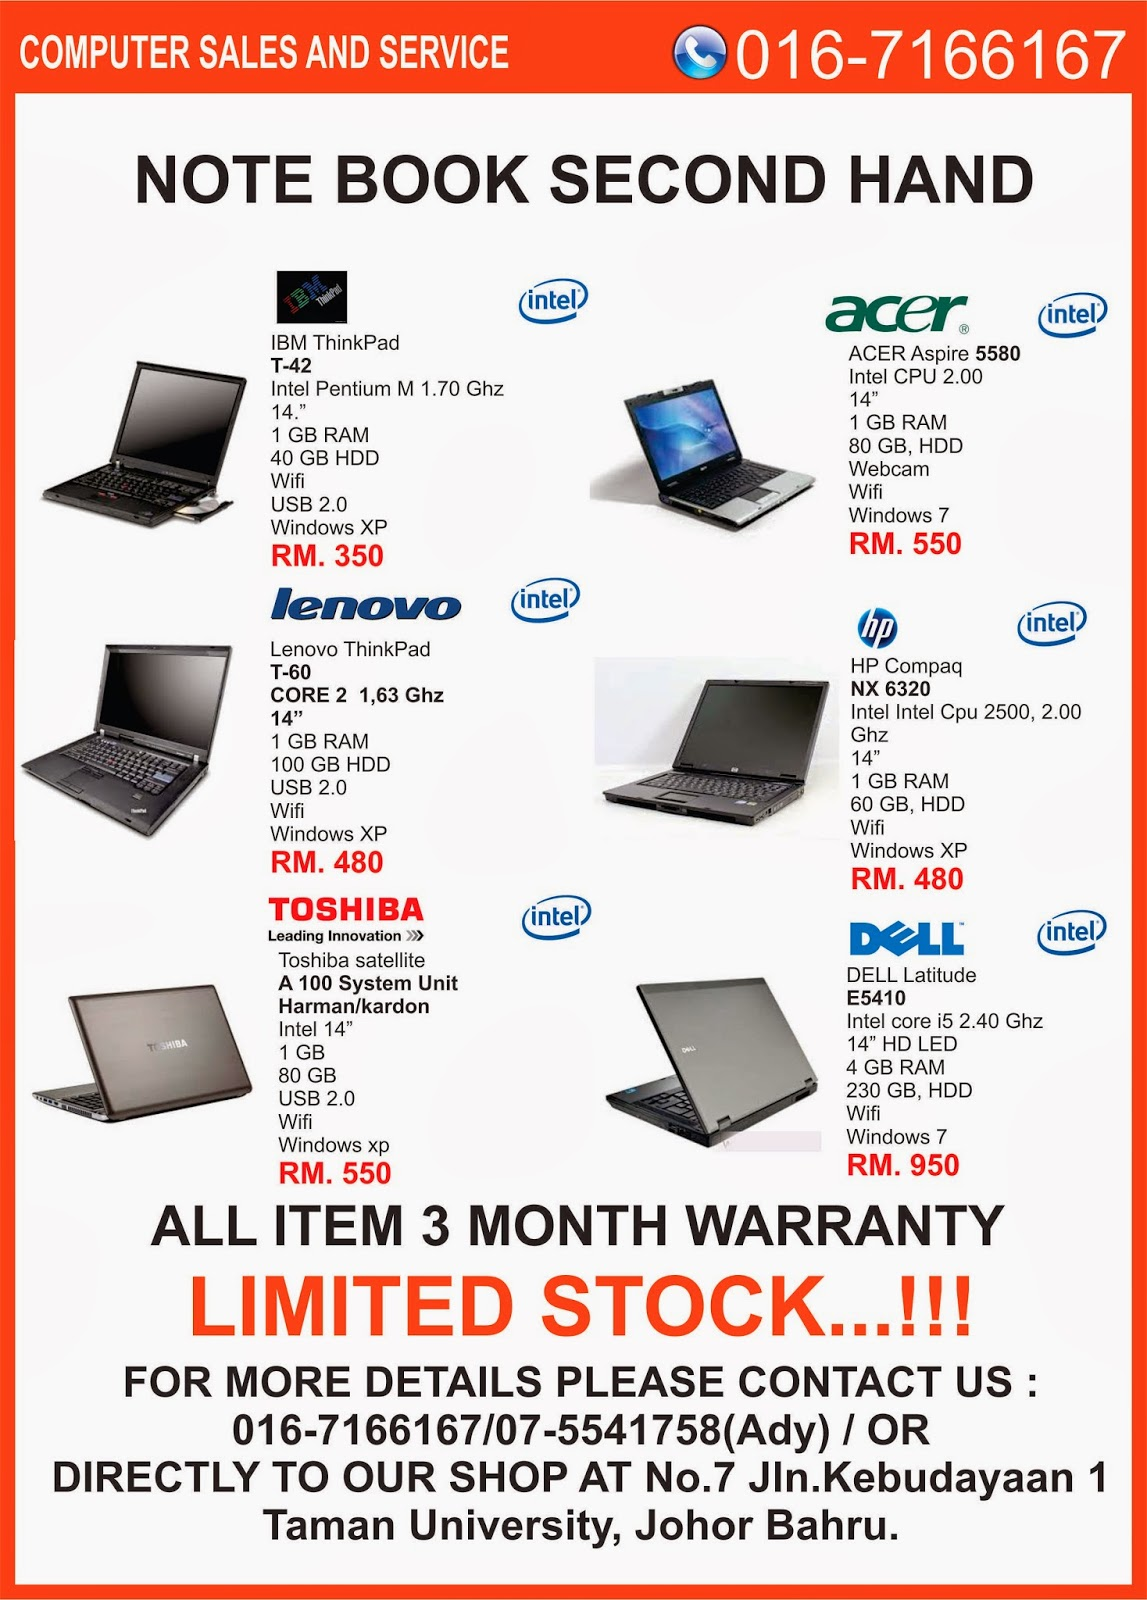 Laptop Murah Komputer Murah Computer Part Baru Terpakai Used Laptop Dell Hp Used Laptops